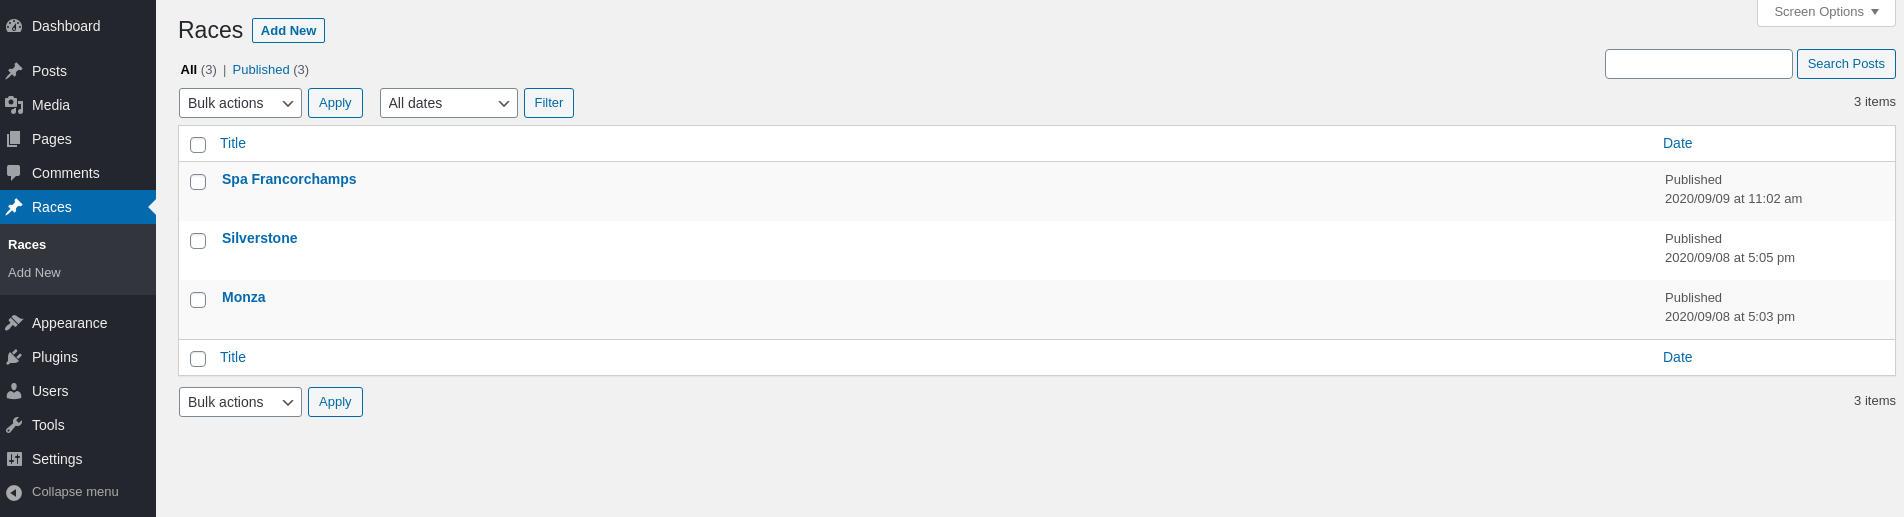 WordPress Custom Post Type in WP Dashboard